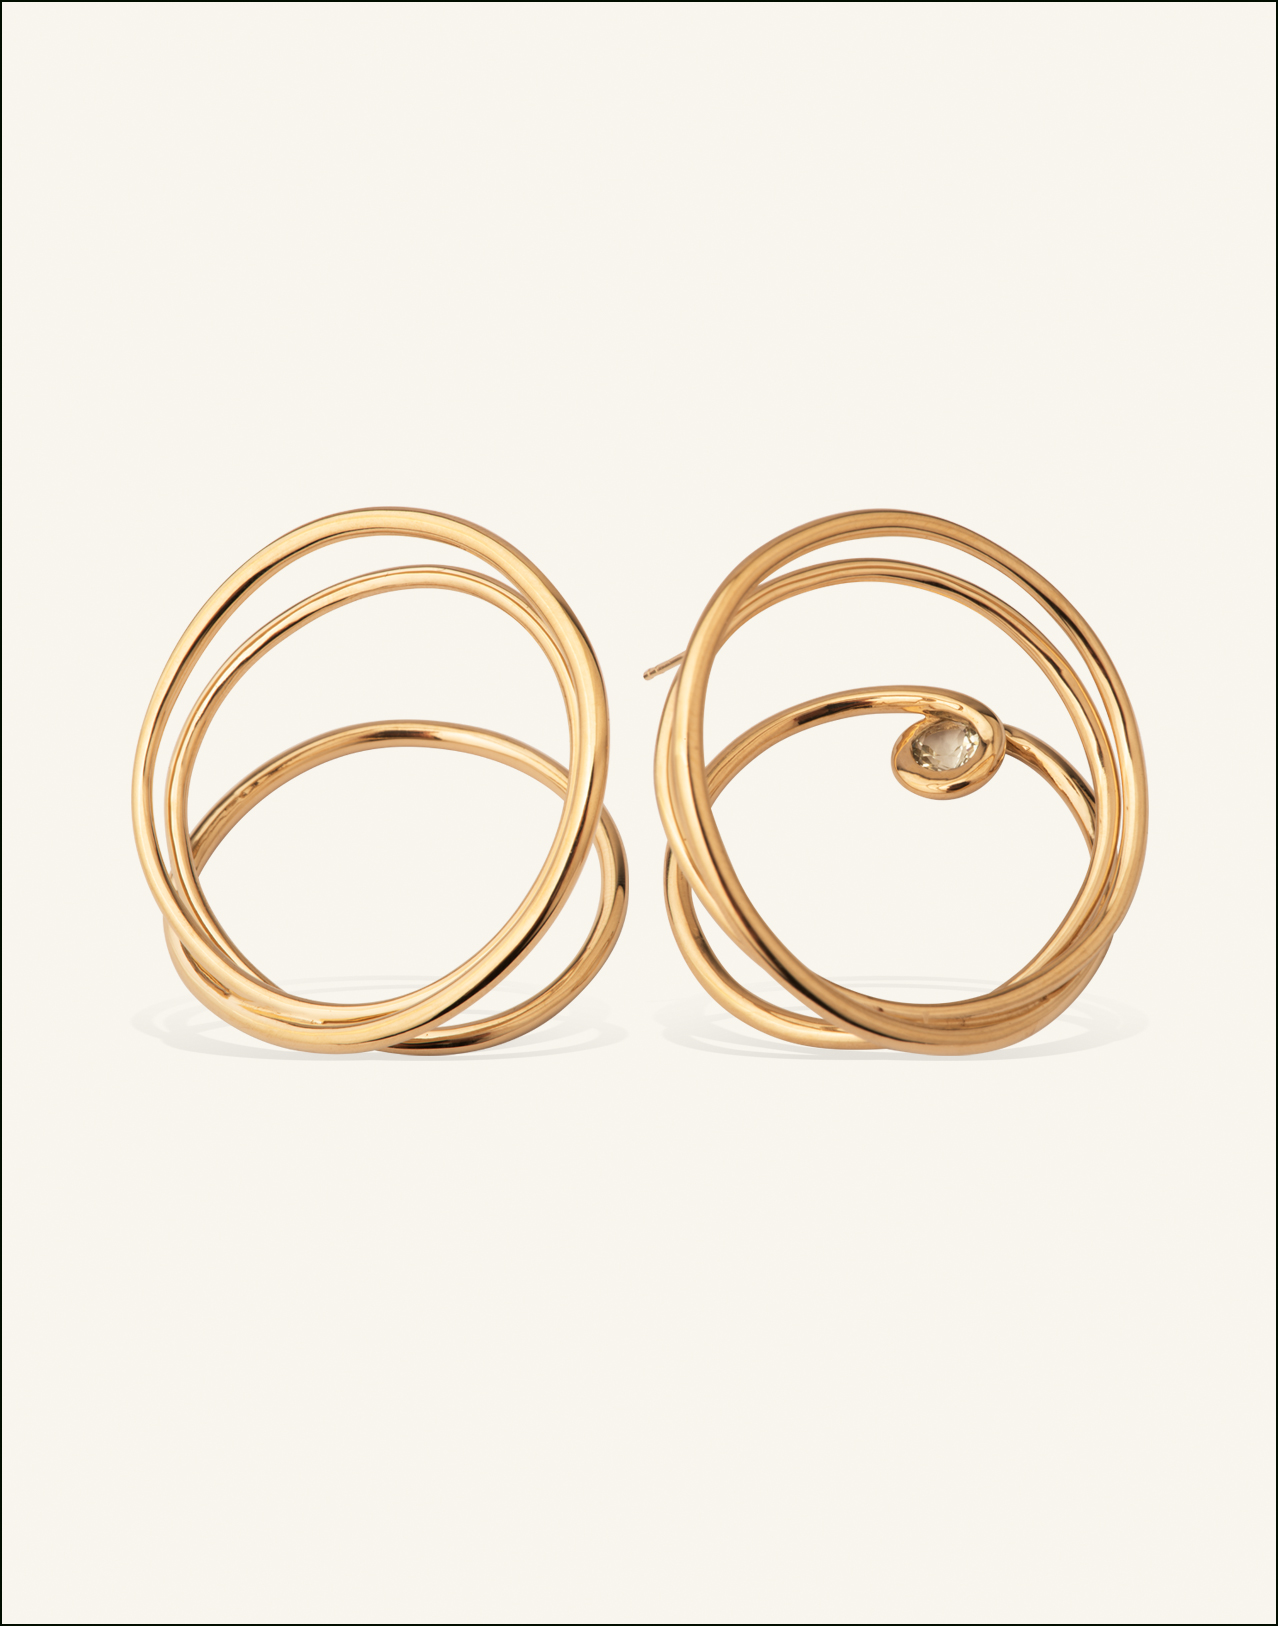 Completedworks-Earrings-Gold-Vermeil-The-Idea-of-Order-2-1.jpg